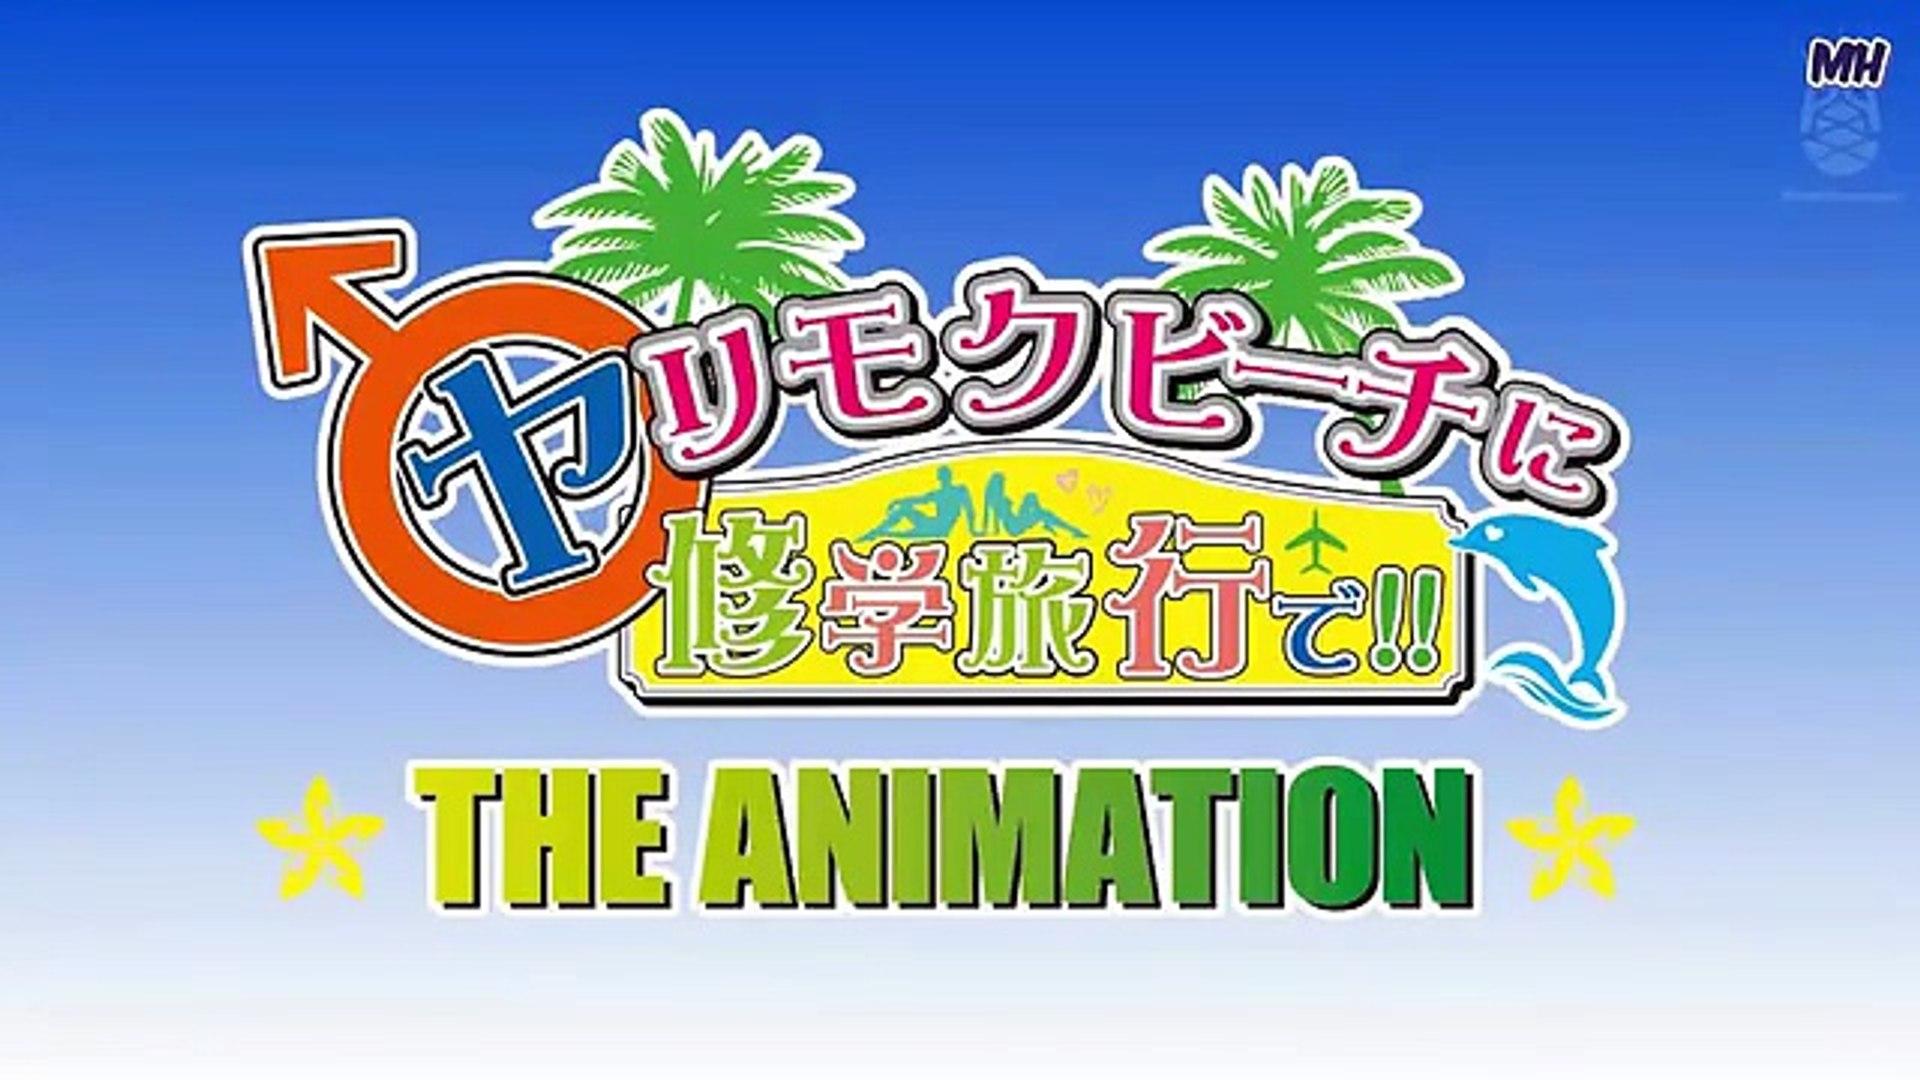 Best Anime Wallpaper Kami: Yarimoku Beach Ni